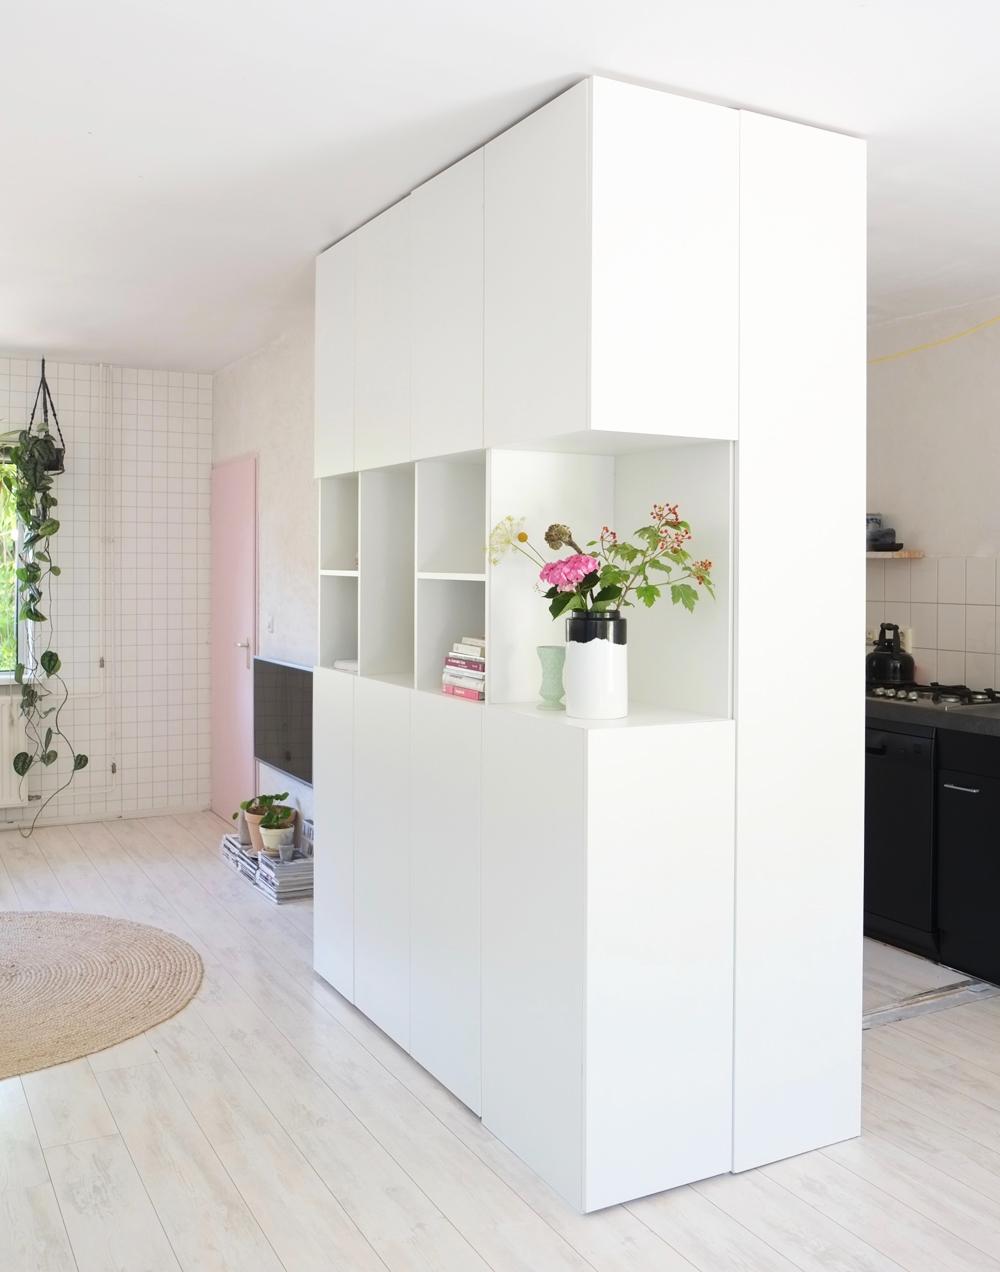 kastopmaat-pimpelwit-interieurontwerp-woonkamer-flexanl-flexa-showhome